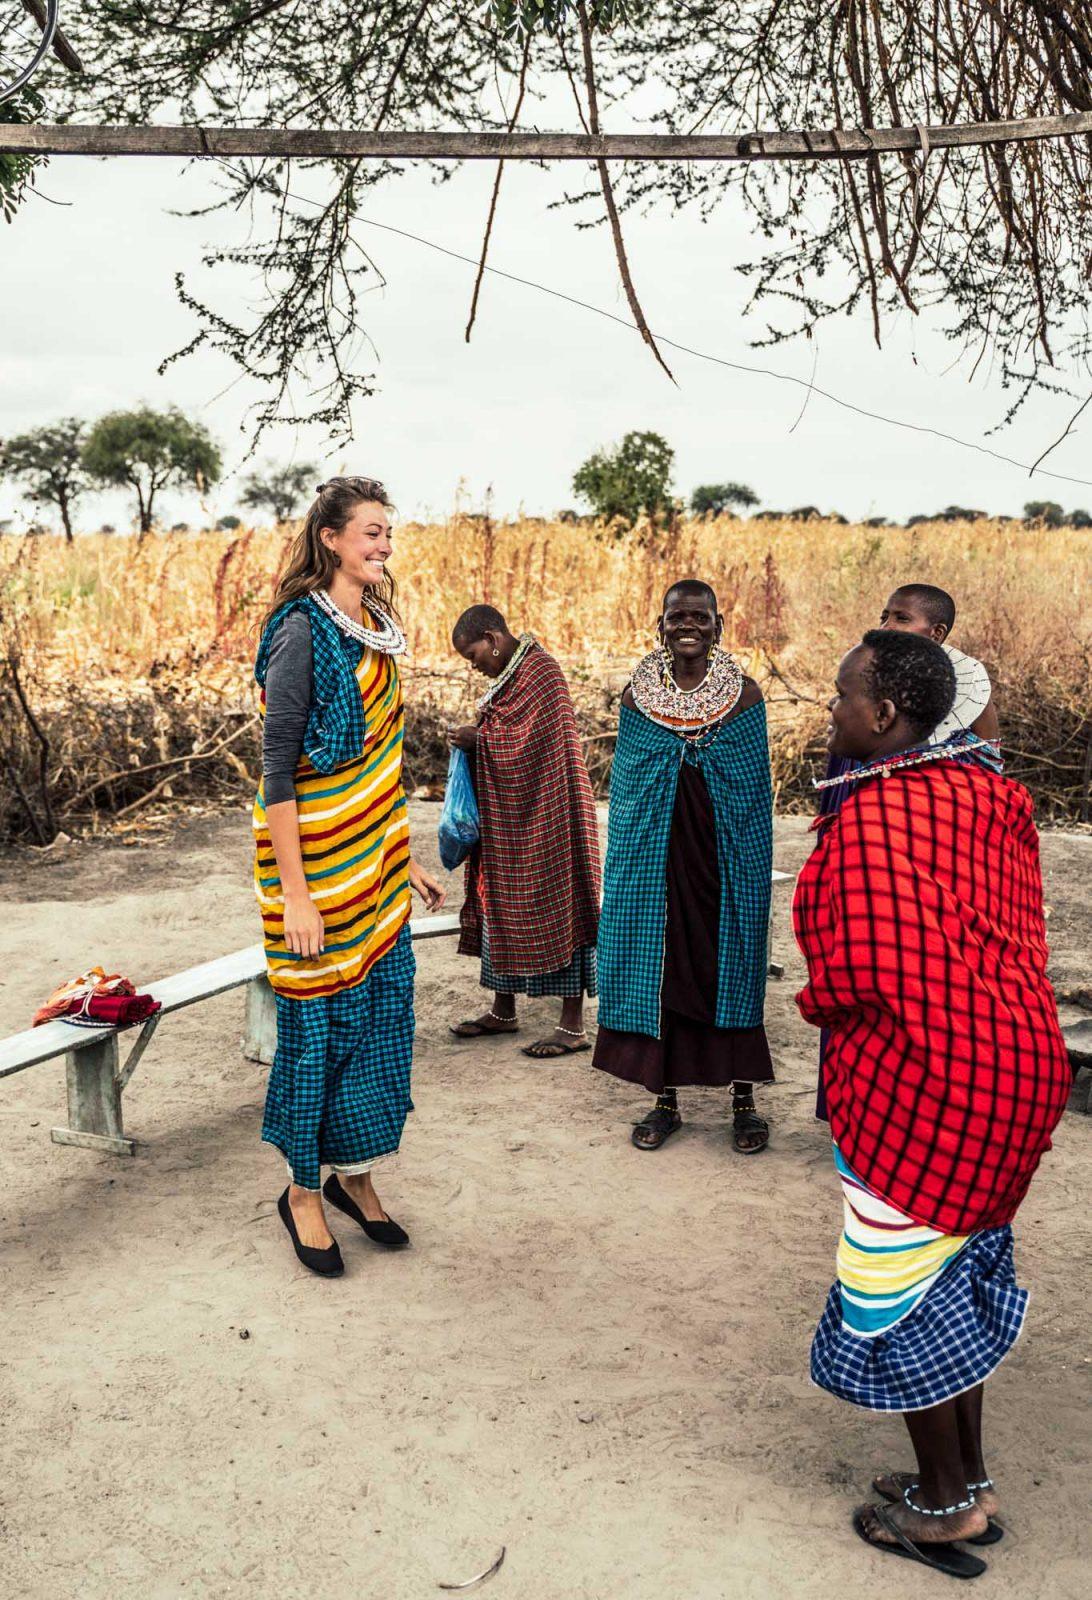 Maasai dancing, Serengeti